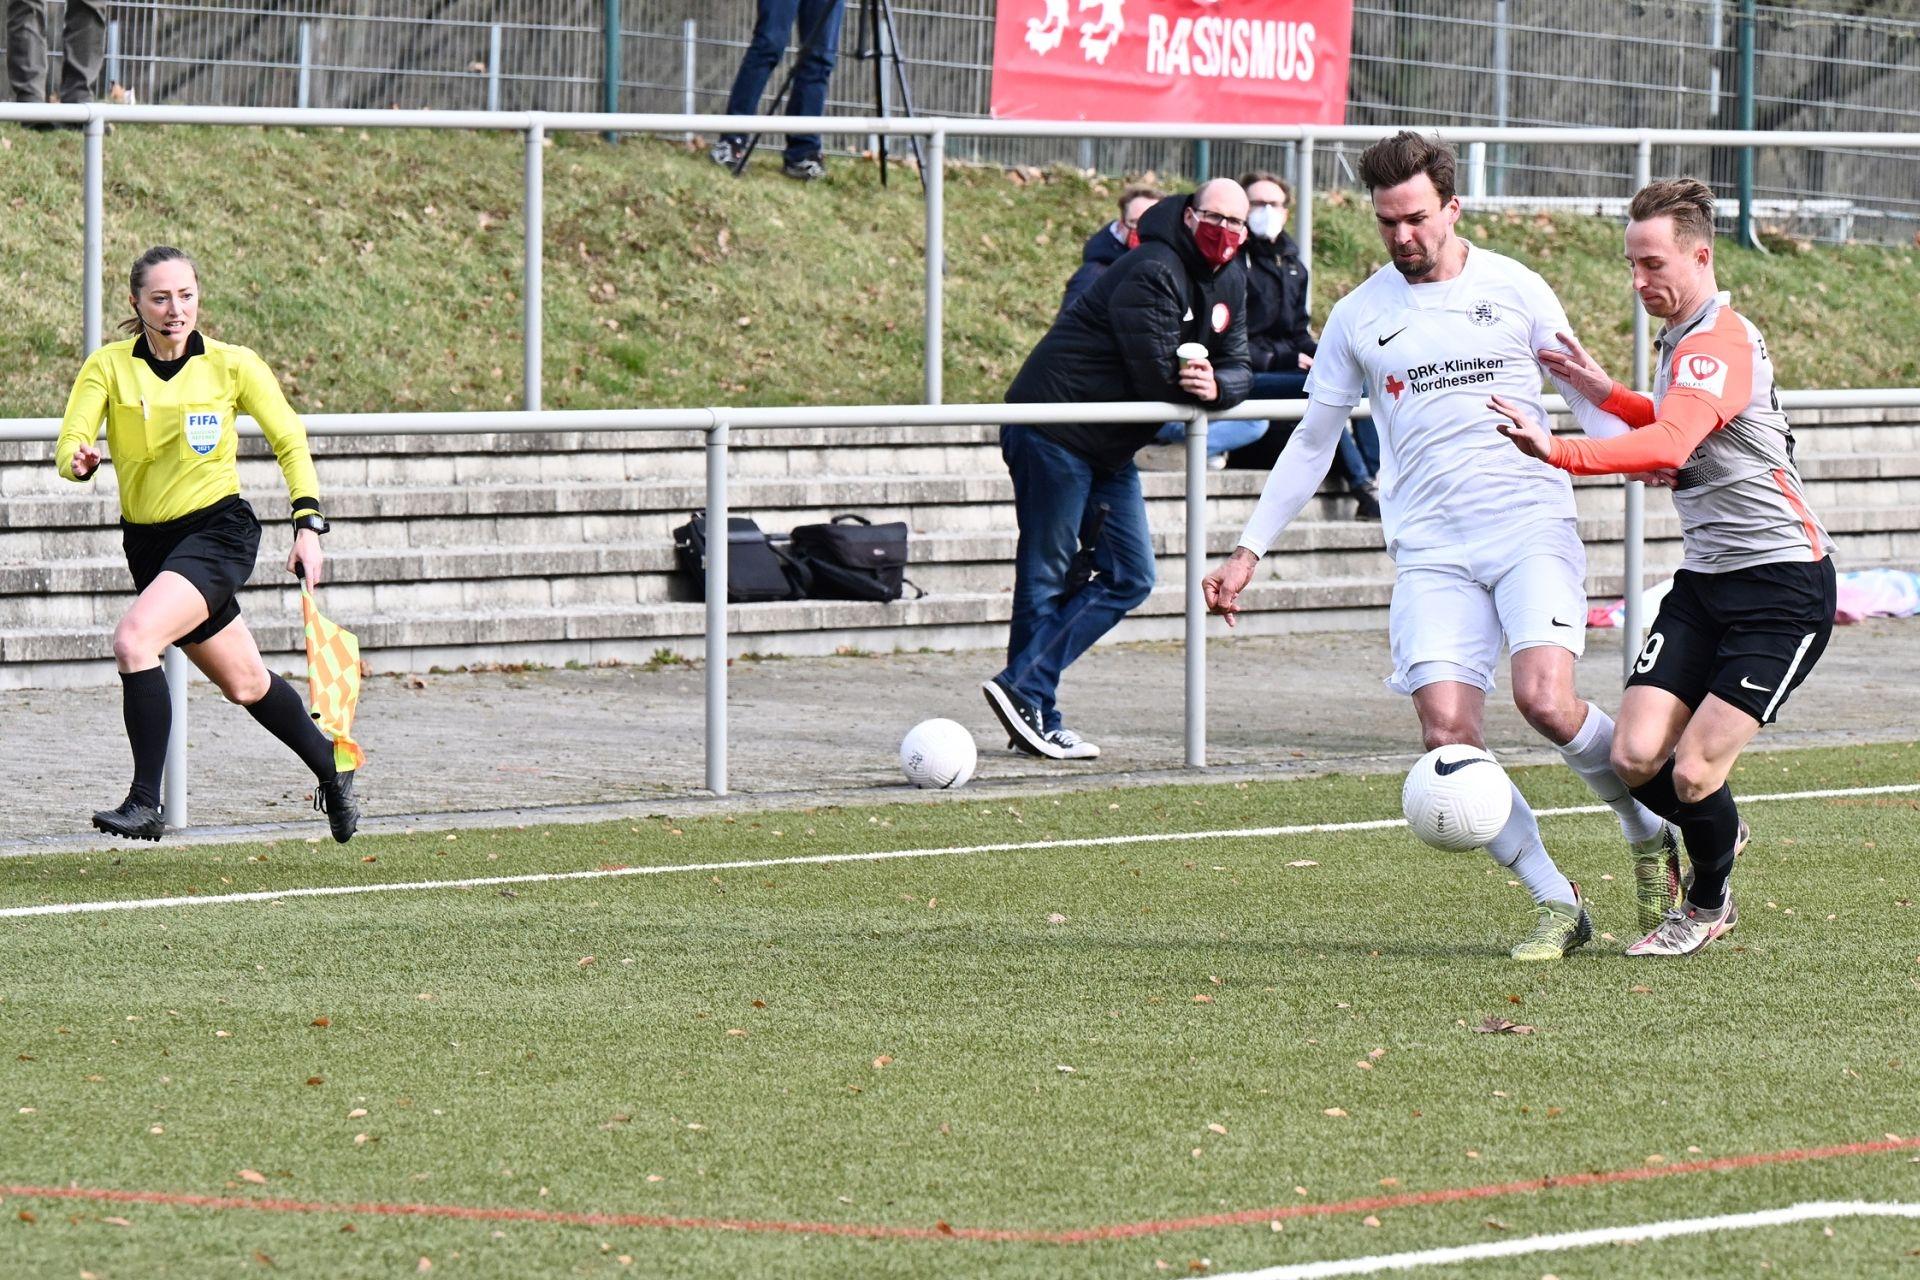 Regionalliga Südwest 2020/21, KSV Hessen Kassel, SV Elversberg, Endstand 0:2, Pichinot